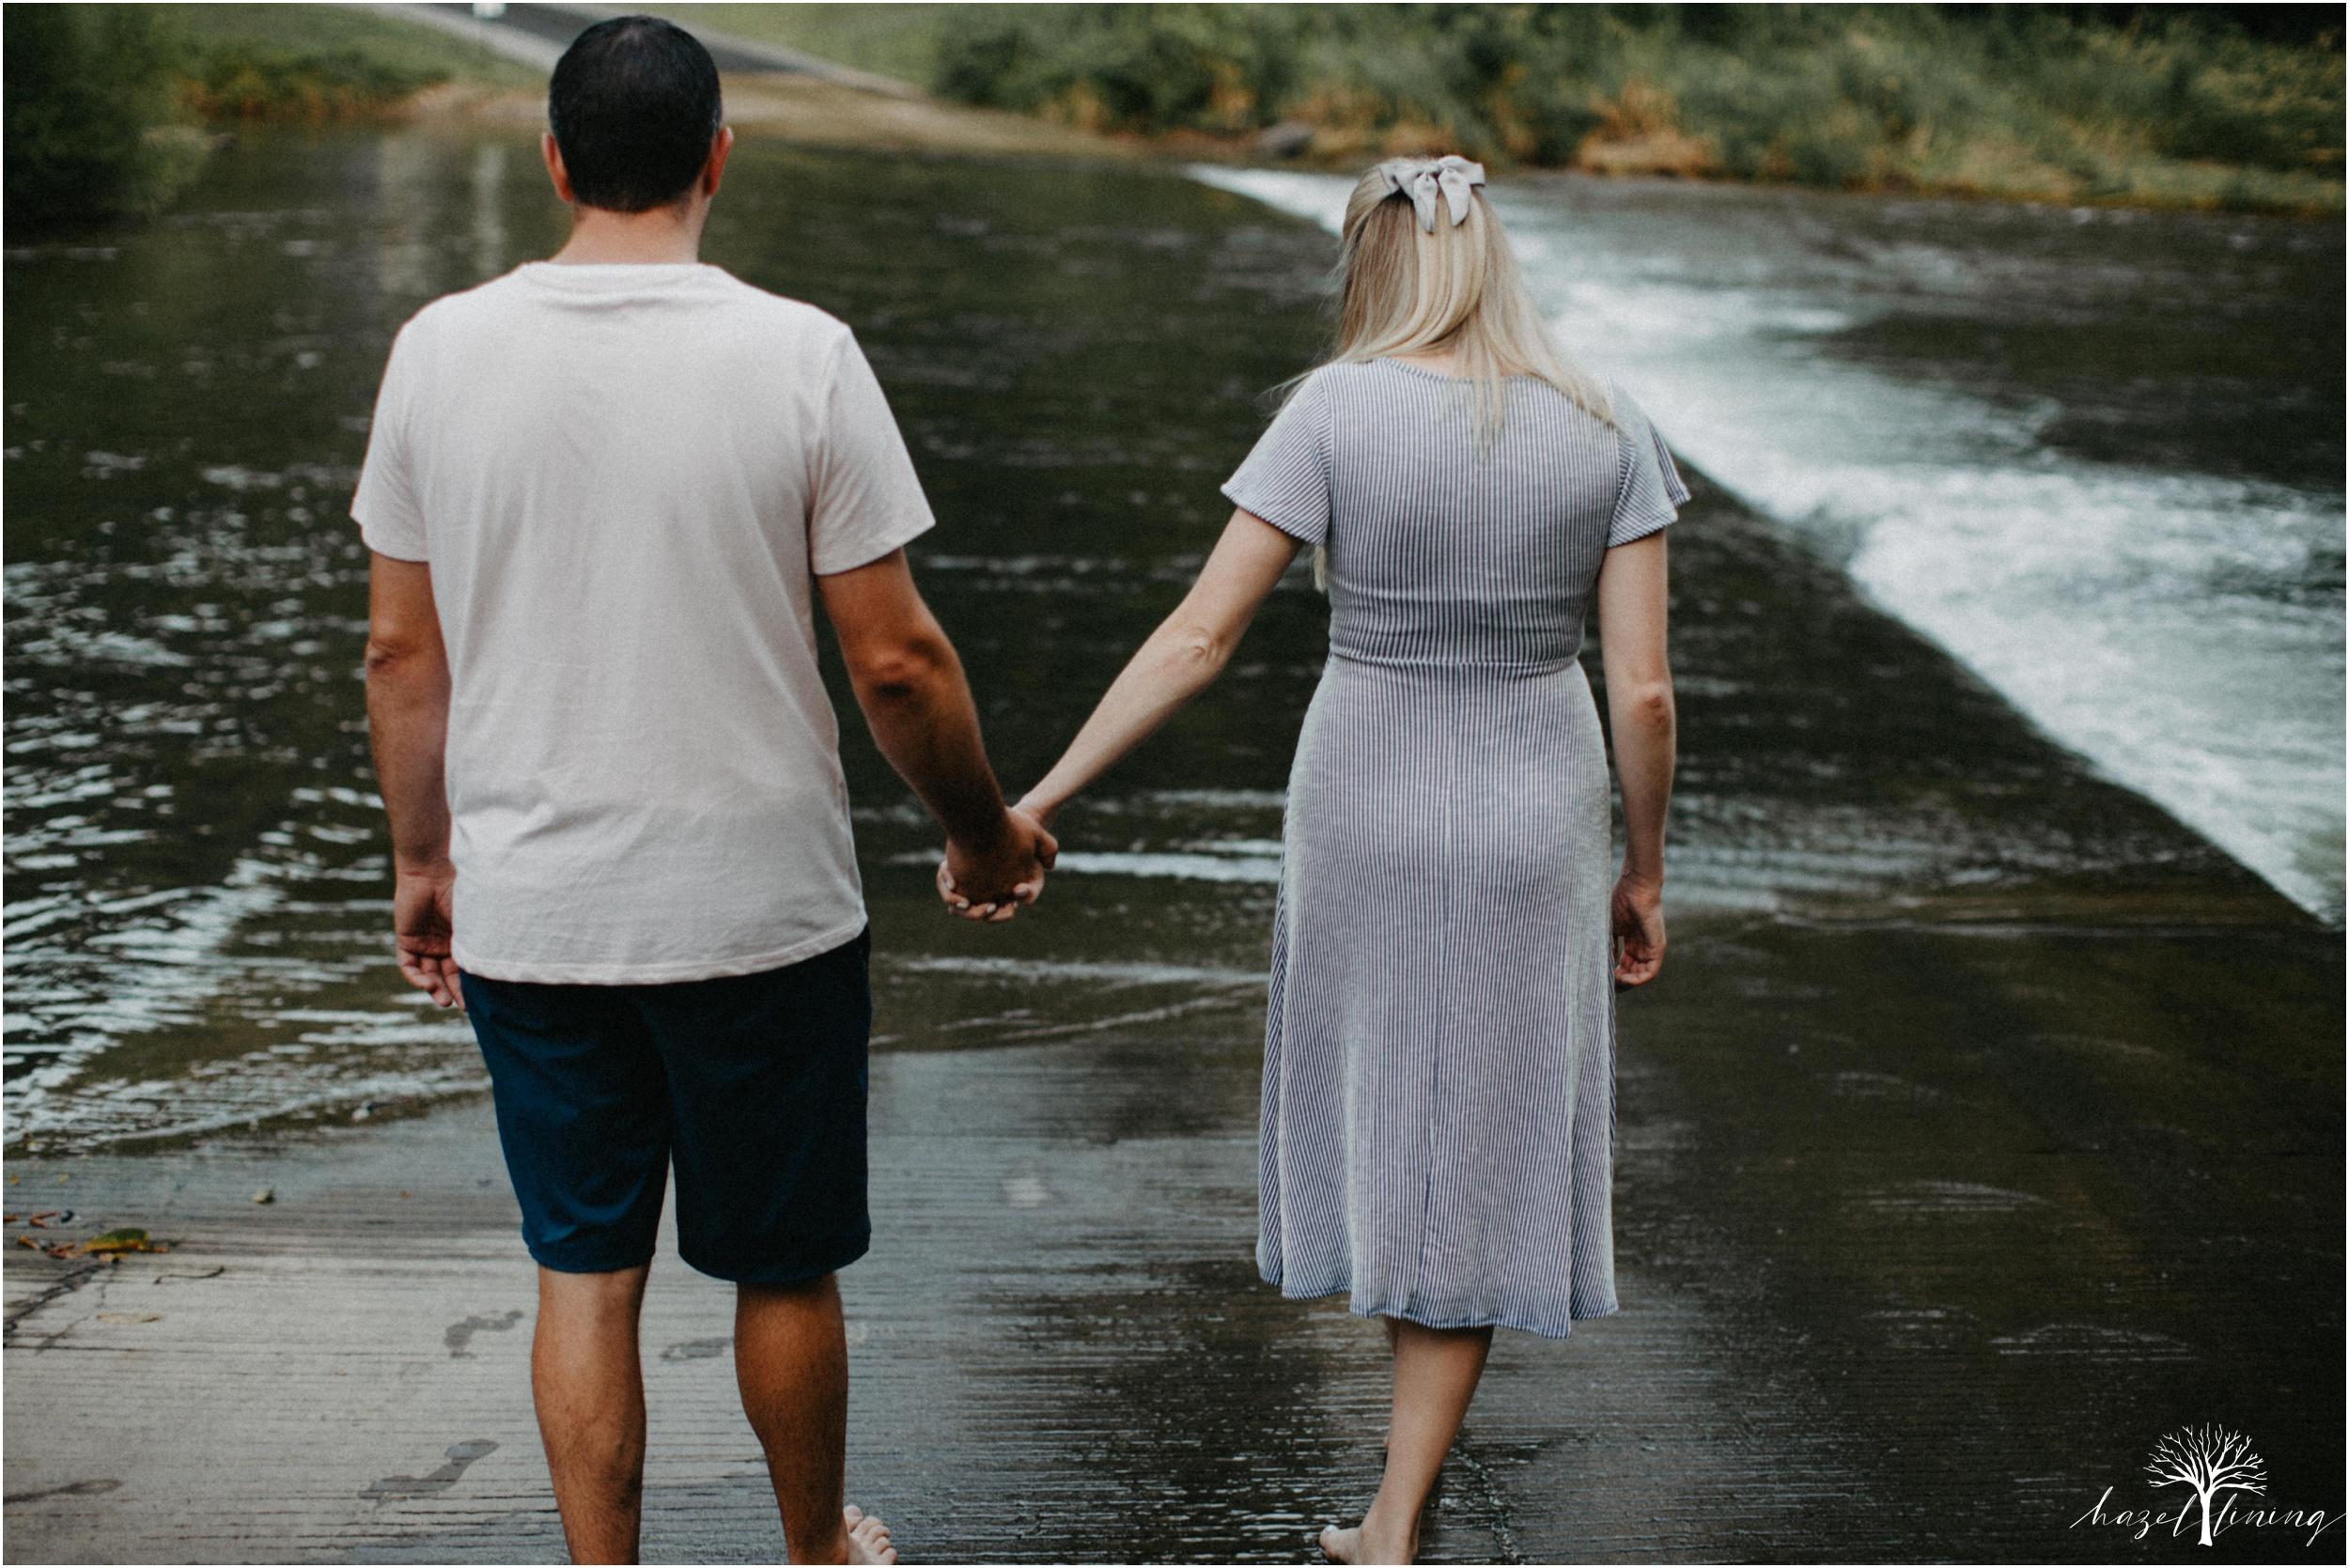 ashley-fillmore-steve-reimer-trexler-nature-preserve-summer-engagement-session-schnecksville-pennsylvania-hazel-lining-photography-destination-elopement-wedding-engagement-photography_0030.jpg